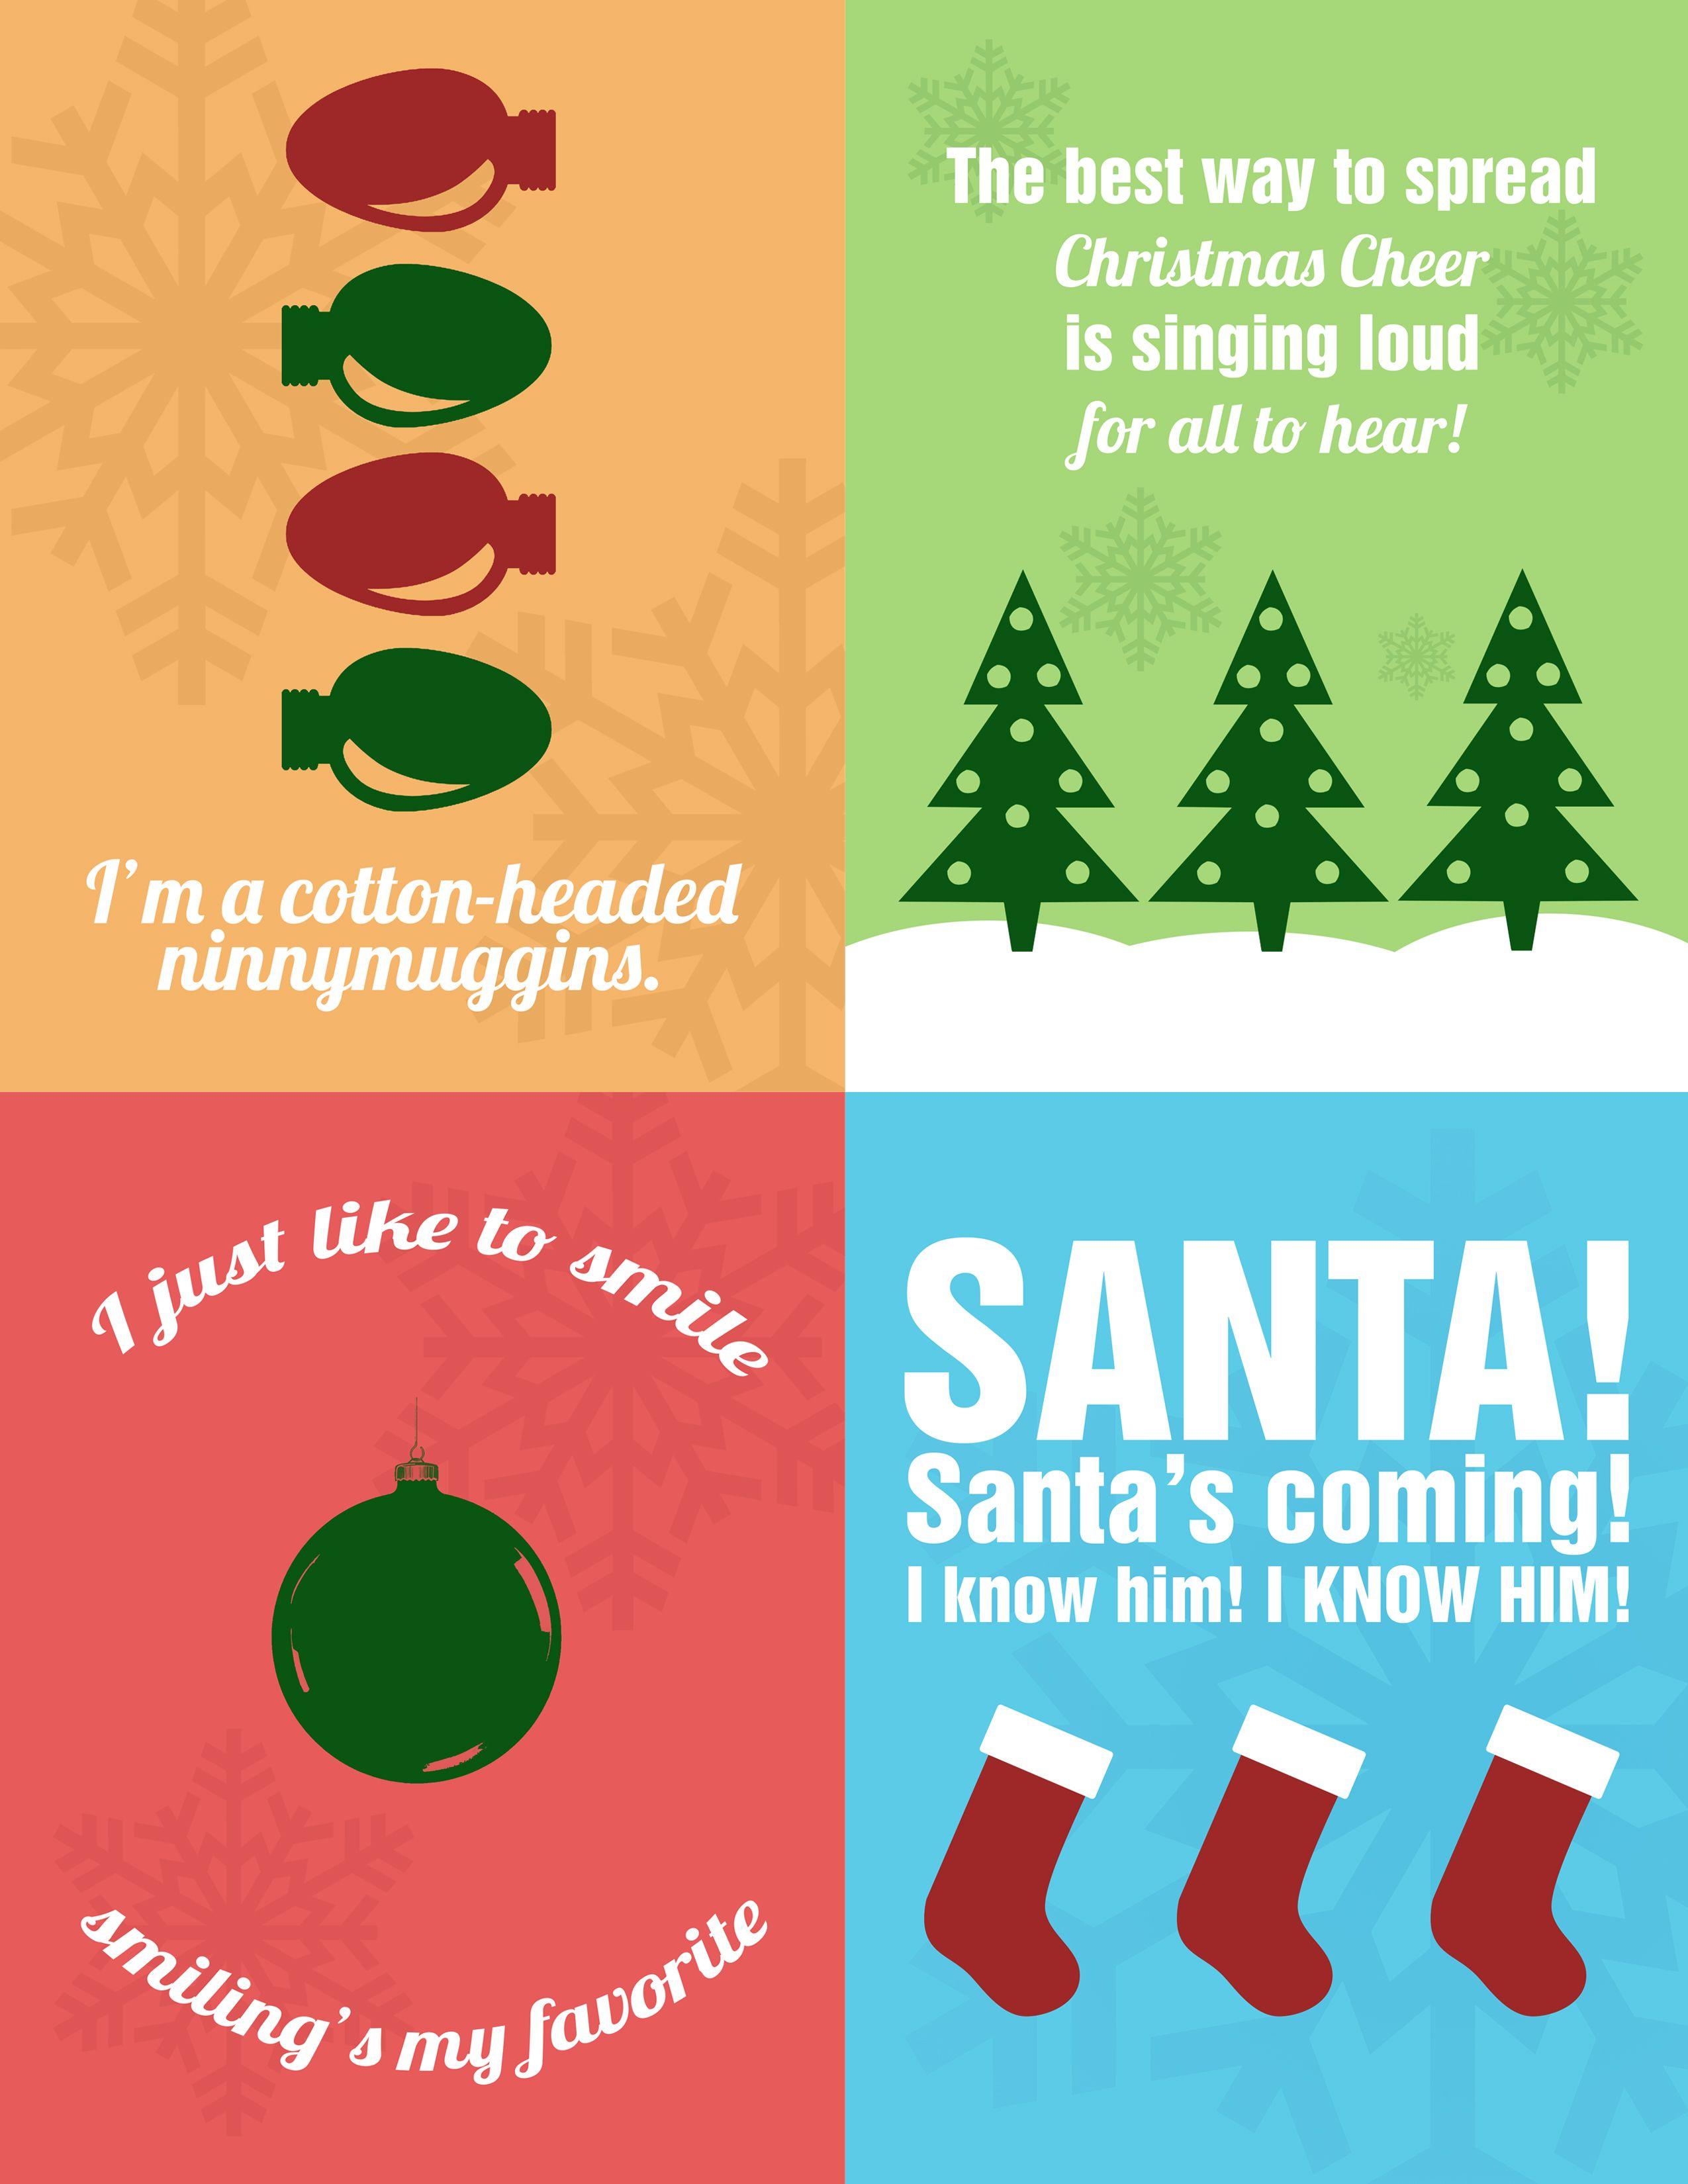 Elf Movie Quotes Christmas Printables Graphic Design Http Galleriabyleah Com Freebies Downloads Christmas Movie Quotes Buddy The Elf Quotes Elf Quotes